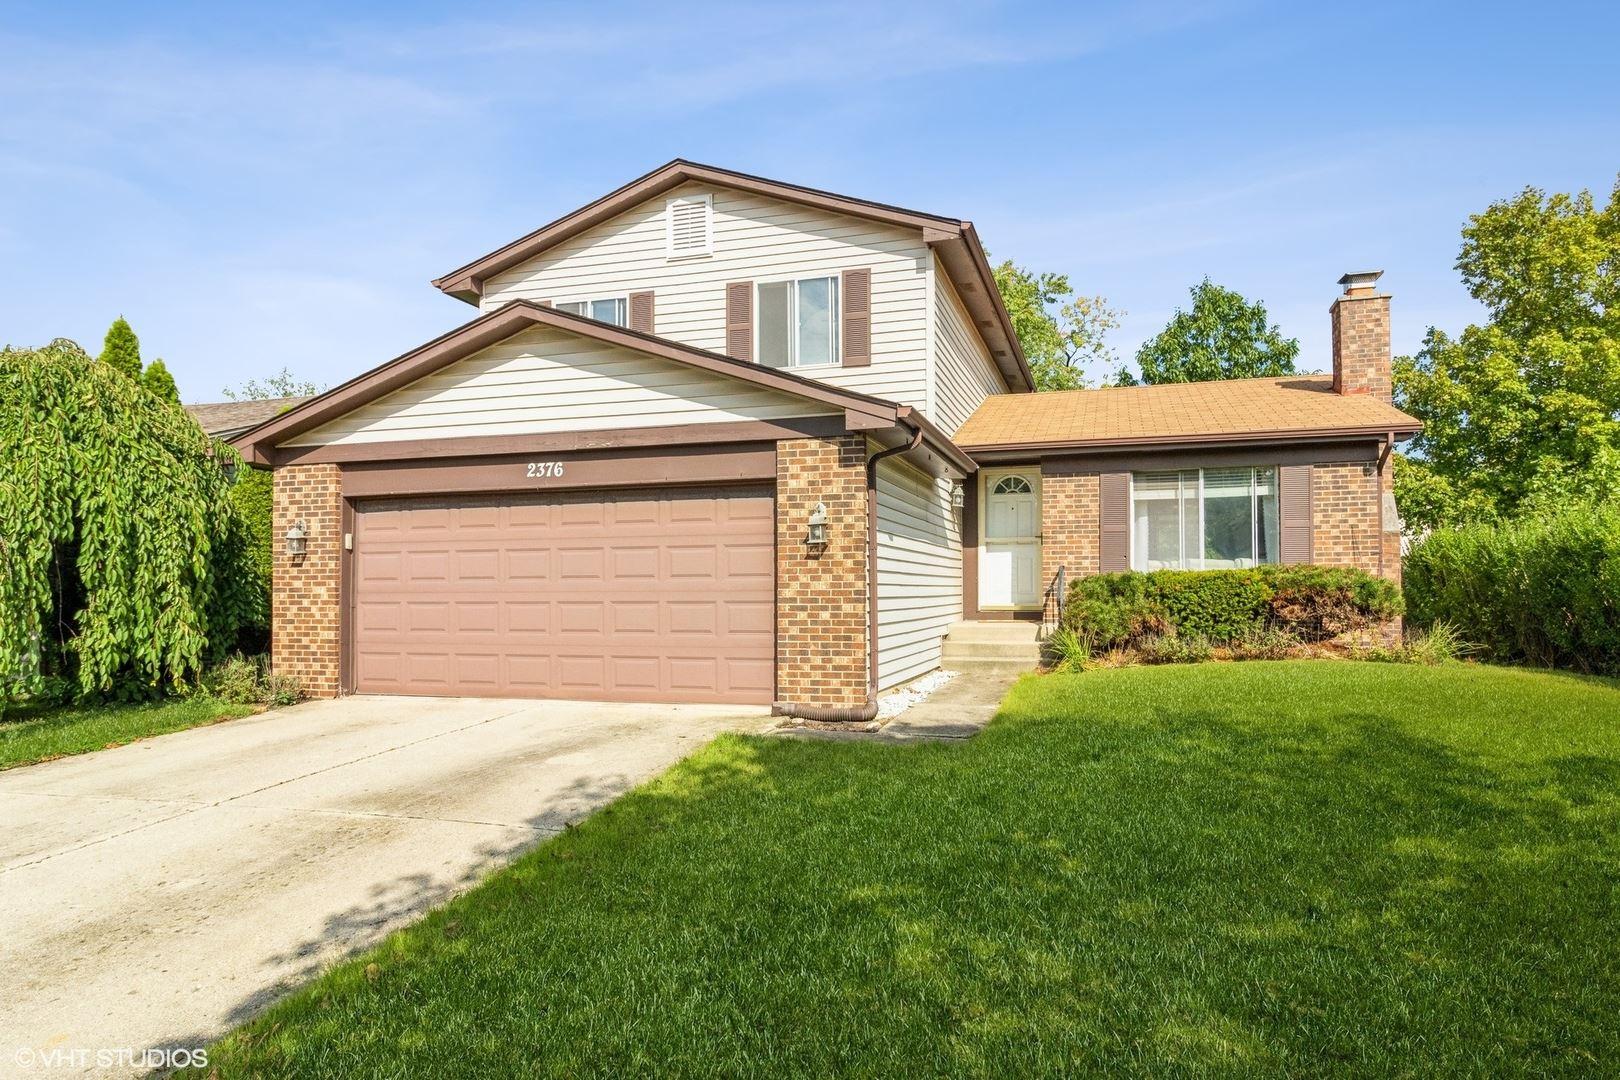 2376 Goldfinch Street, Woodridge, IL 60517 - #: 11247641